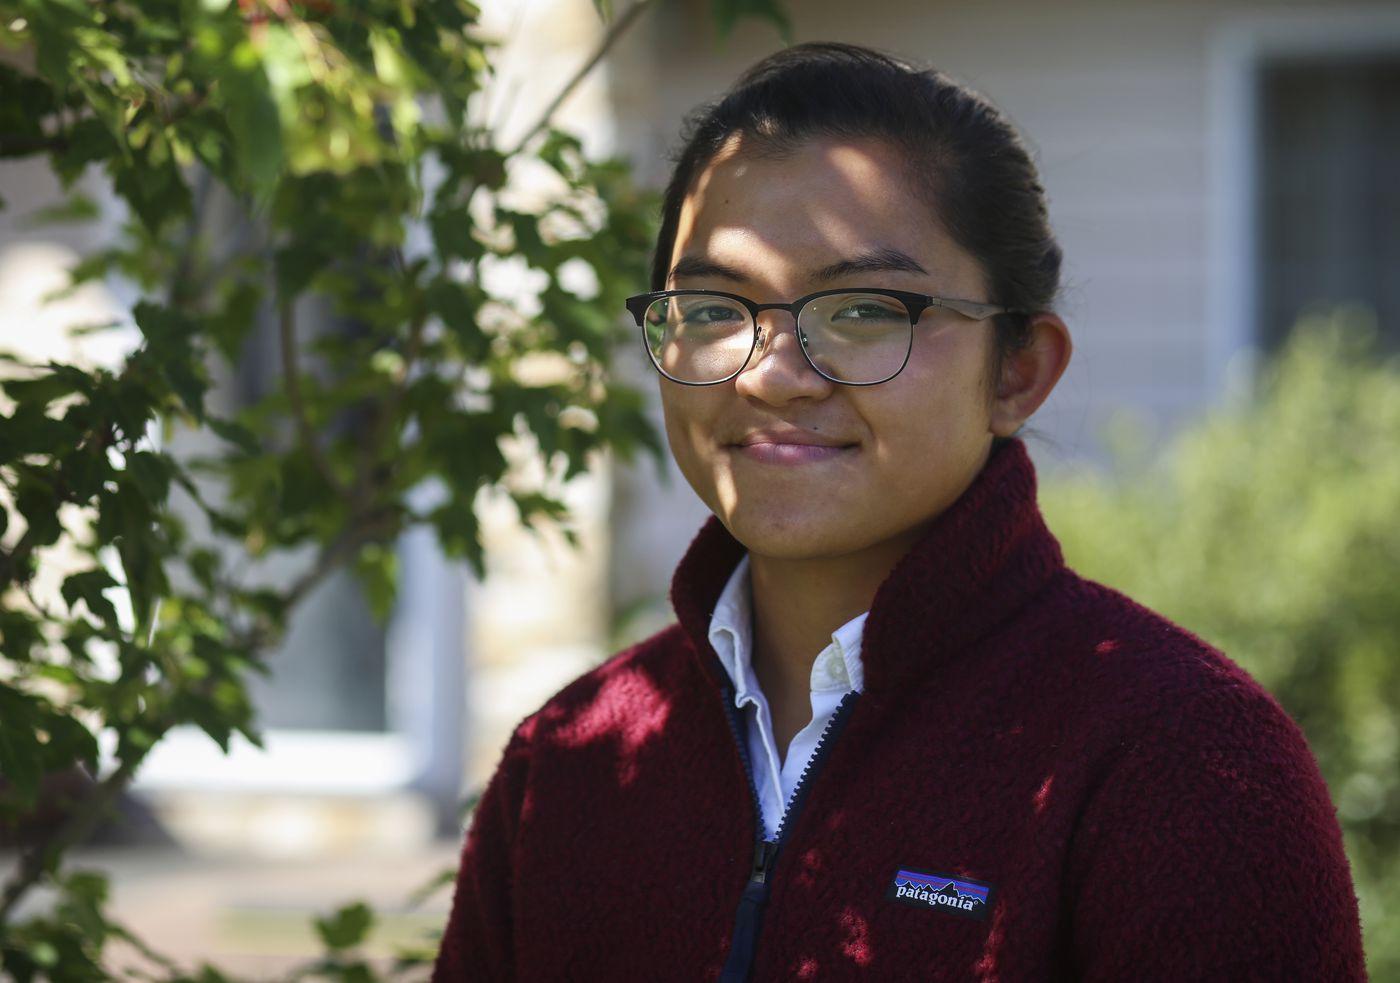 Bartlett High School student Allysa Wesierski outside her home in Anchorage, on Aug. 20, 2020. Wesierski started her senior year remotely due to the coronavirus pandemic. (Emily Mesner / ADN)